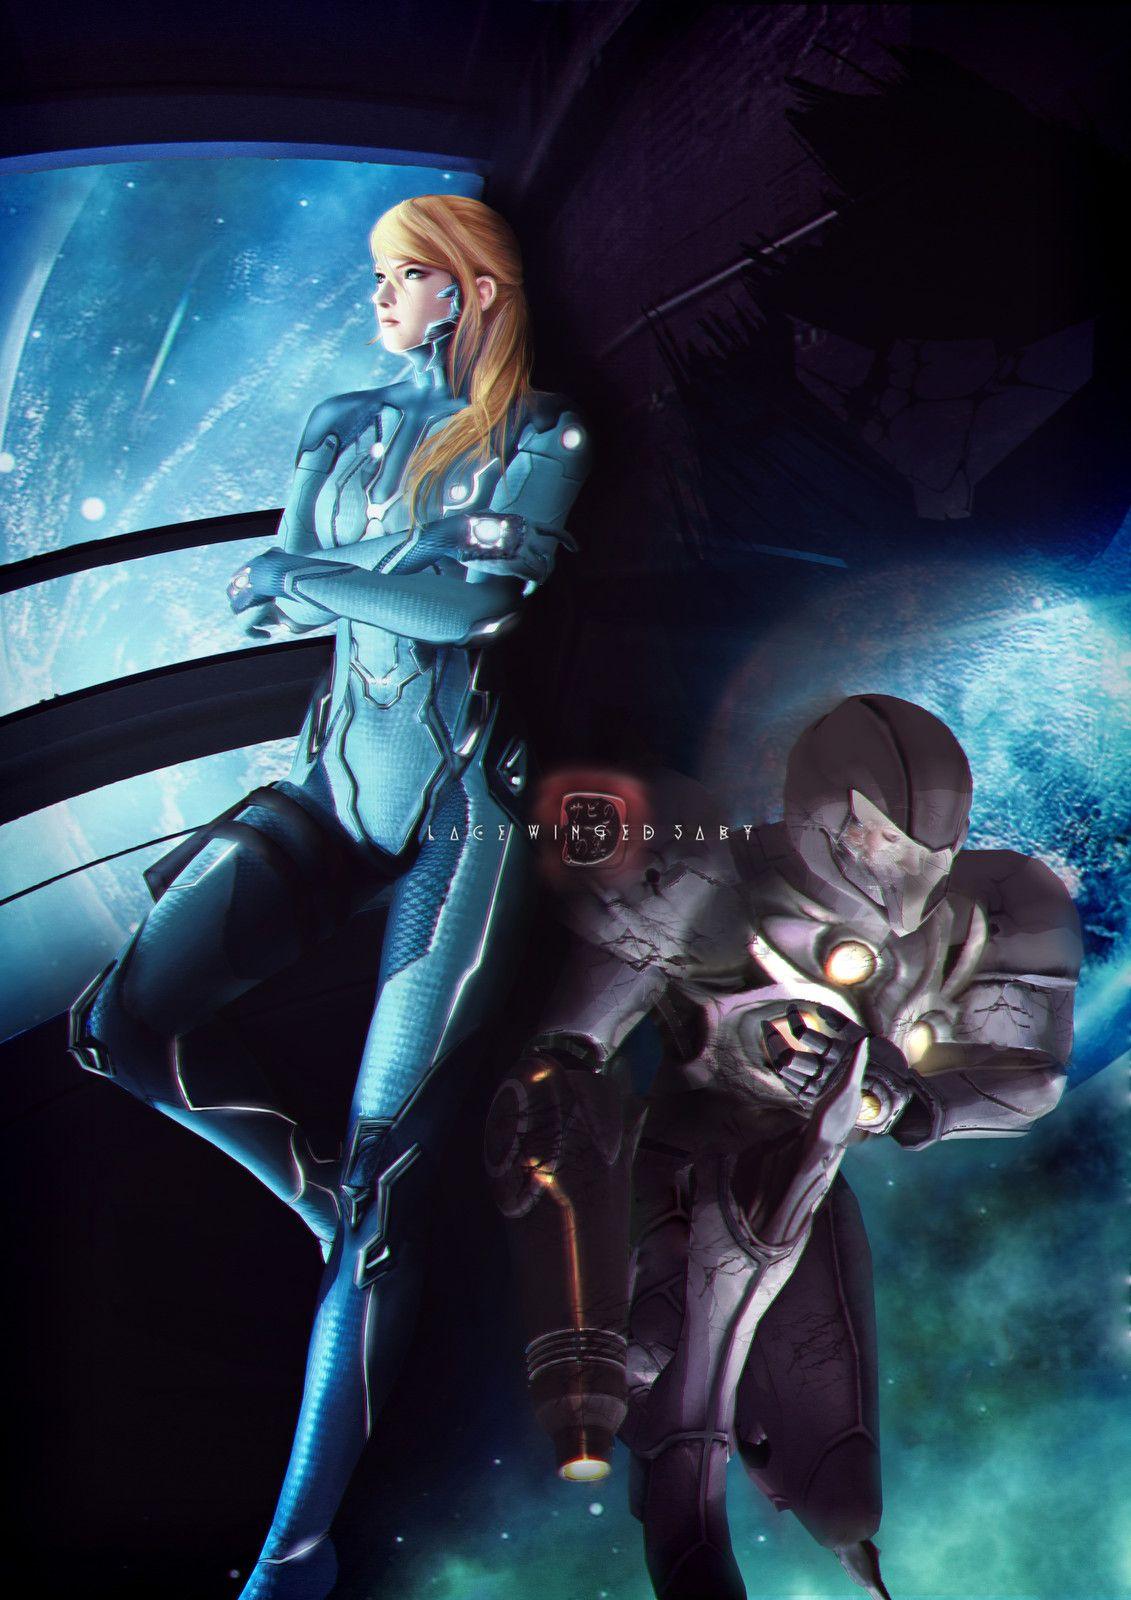 Samus Aran [Metroid] - Commission, LaceWingedSaby サビのレースの翼